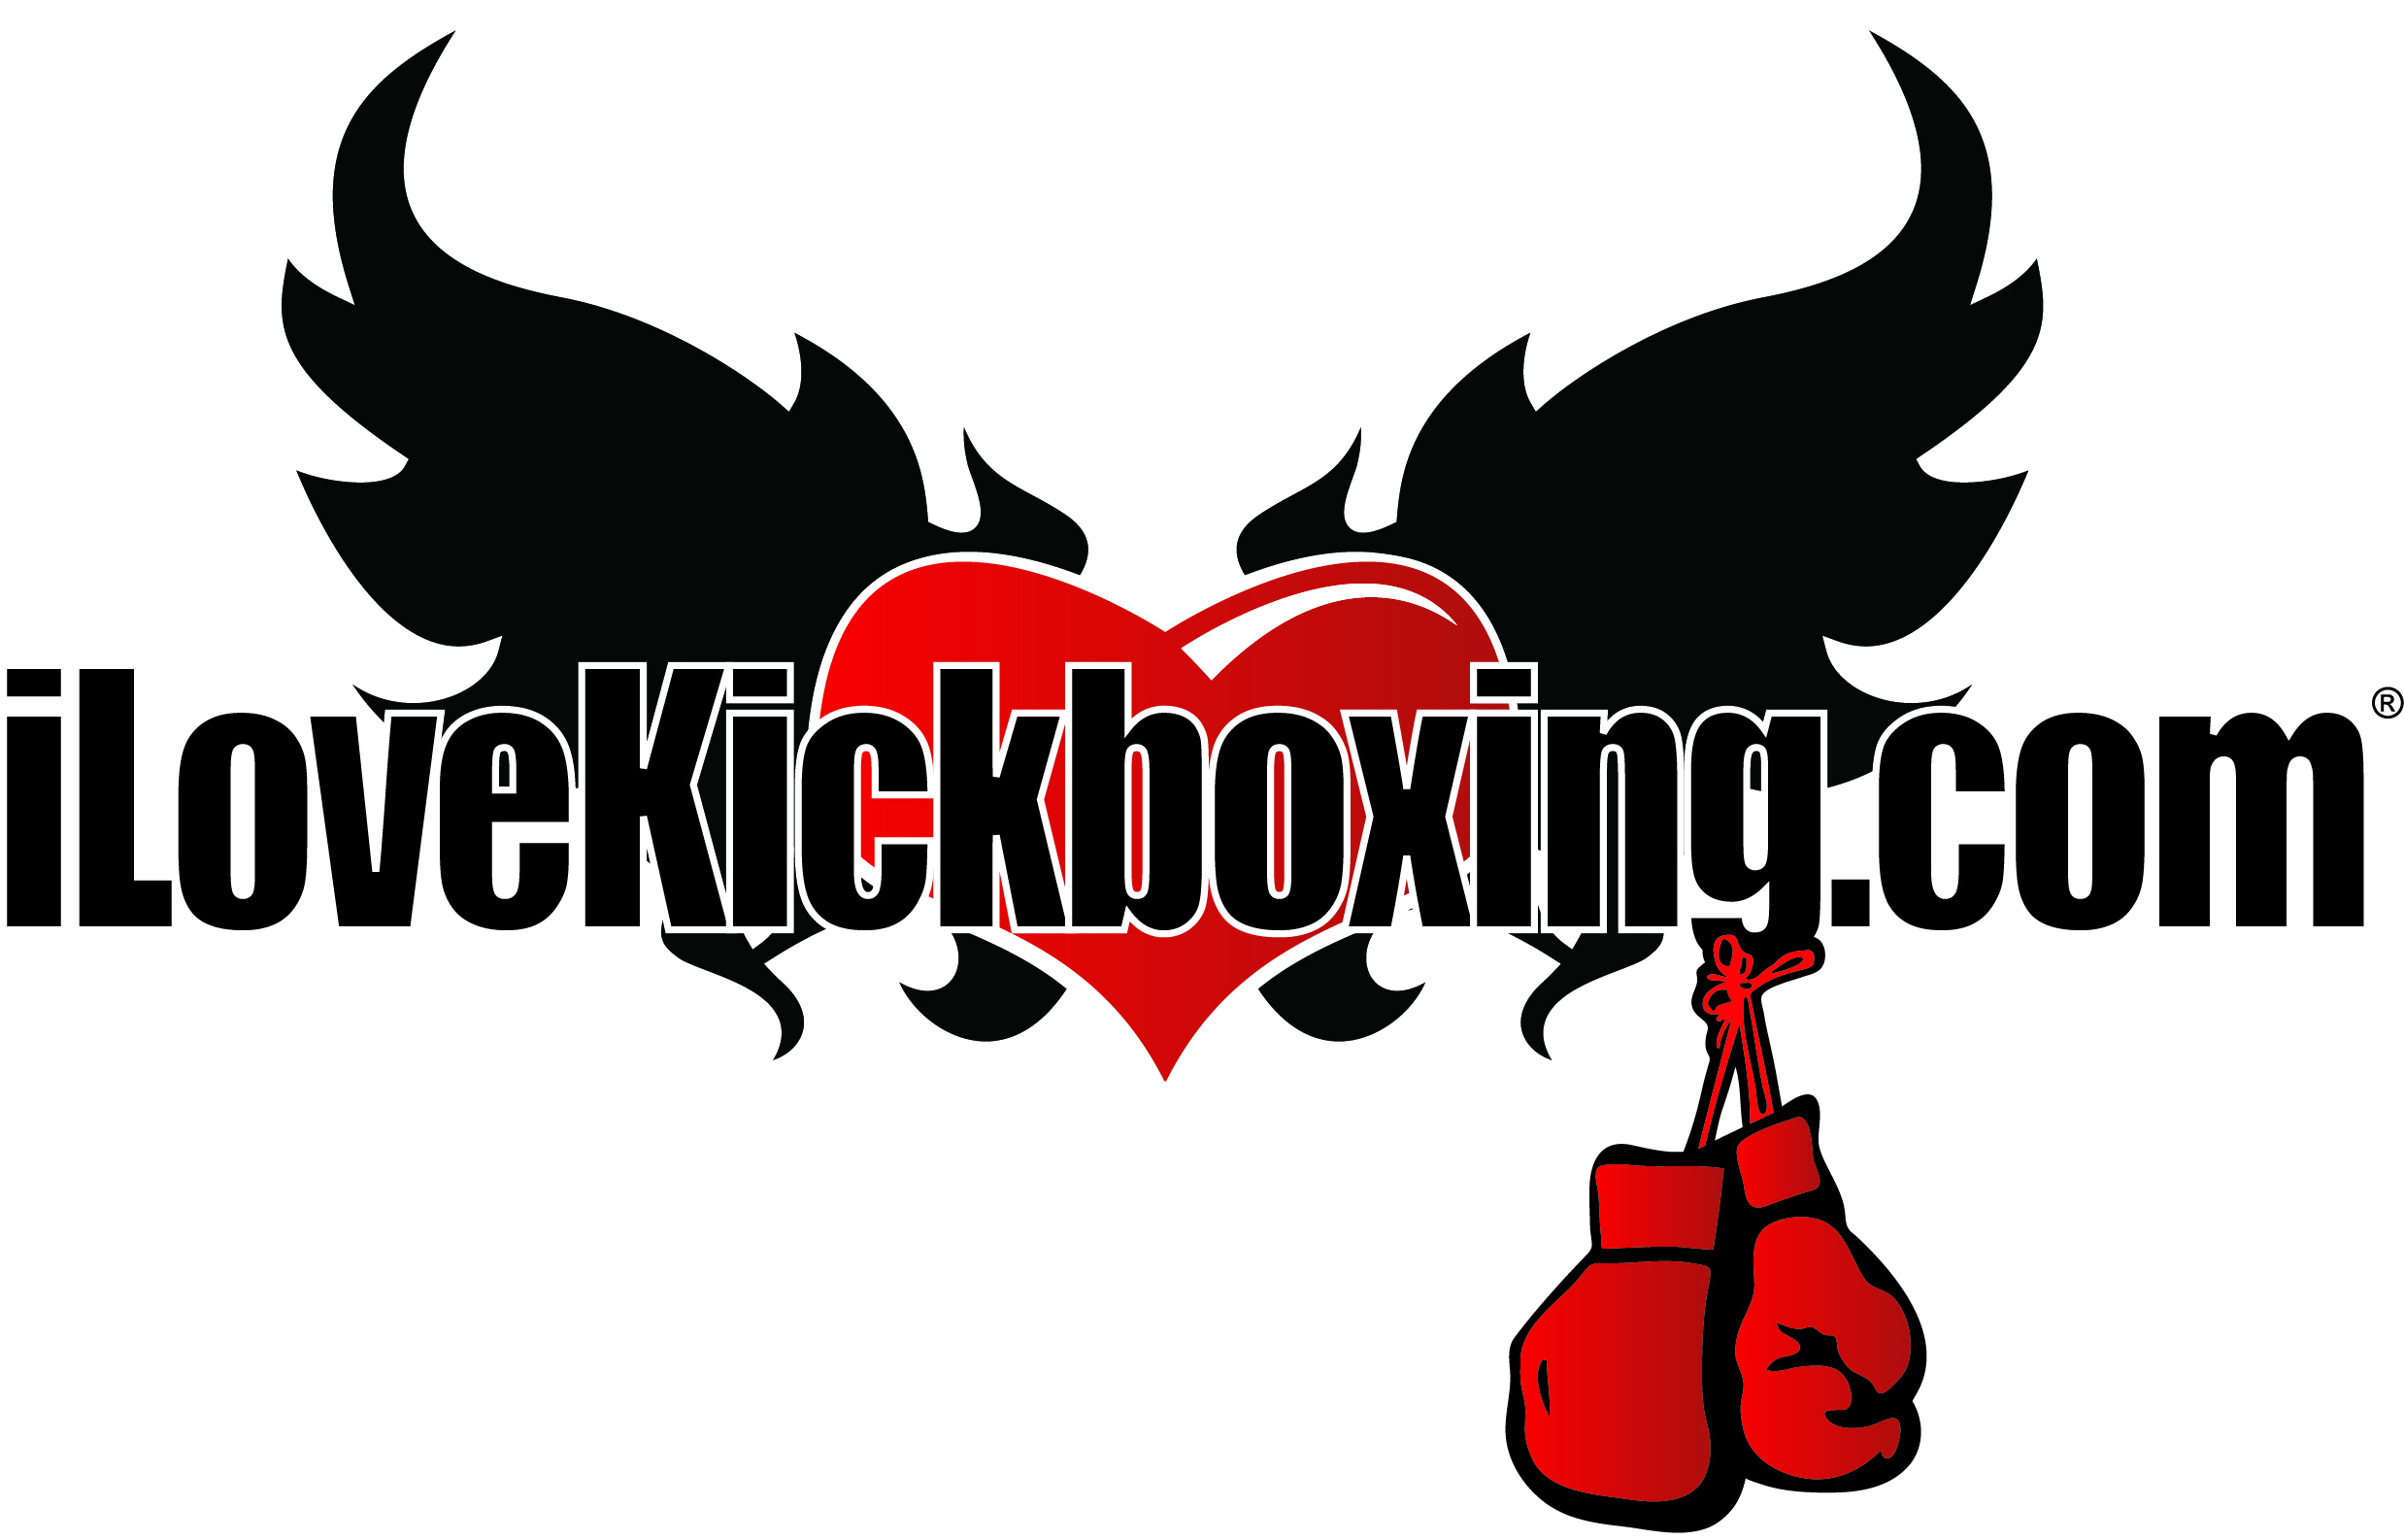 I Love Kickboxing - North Providence